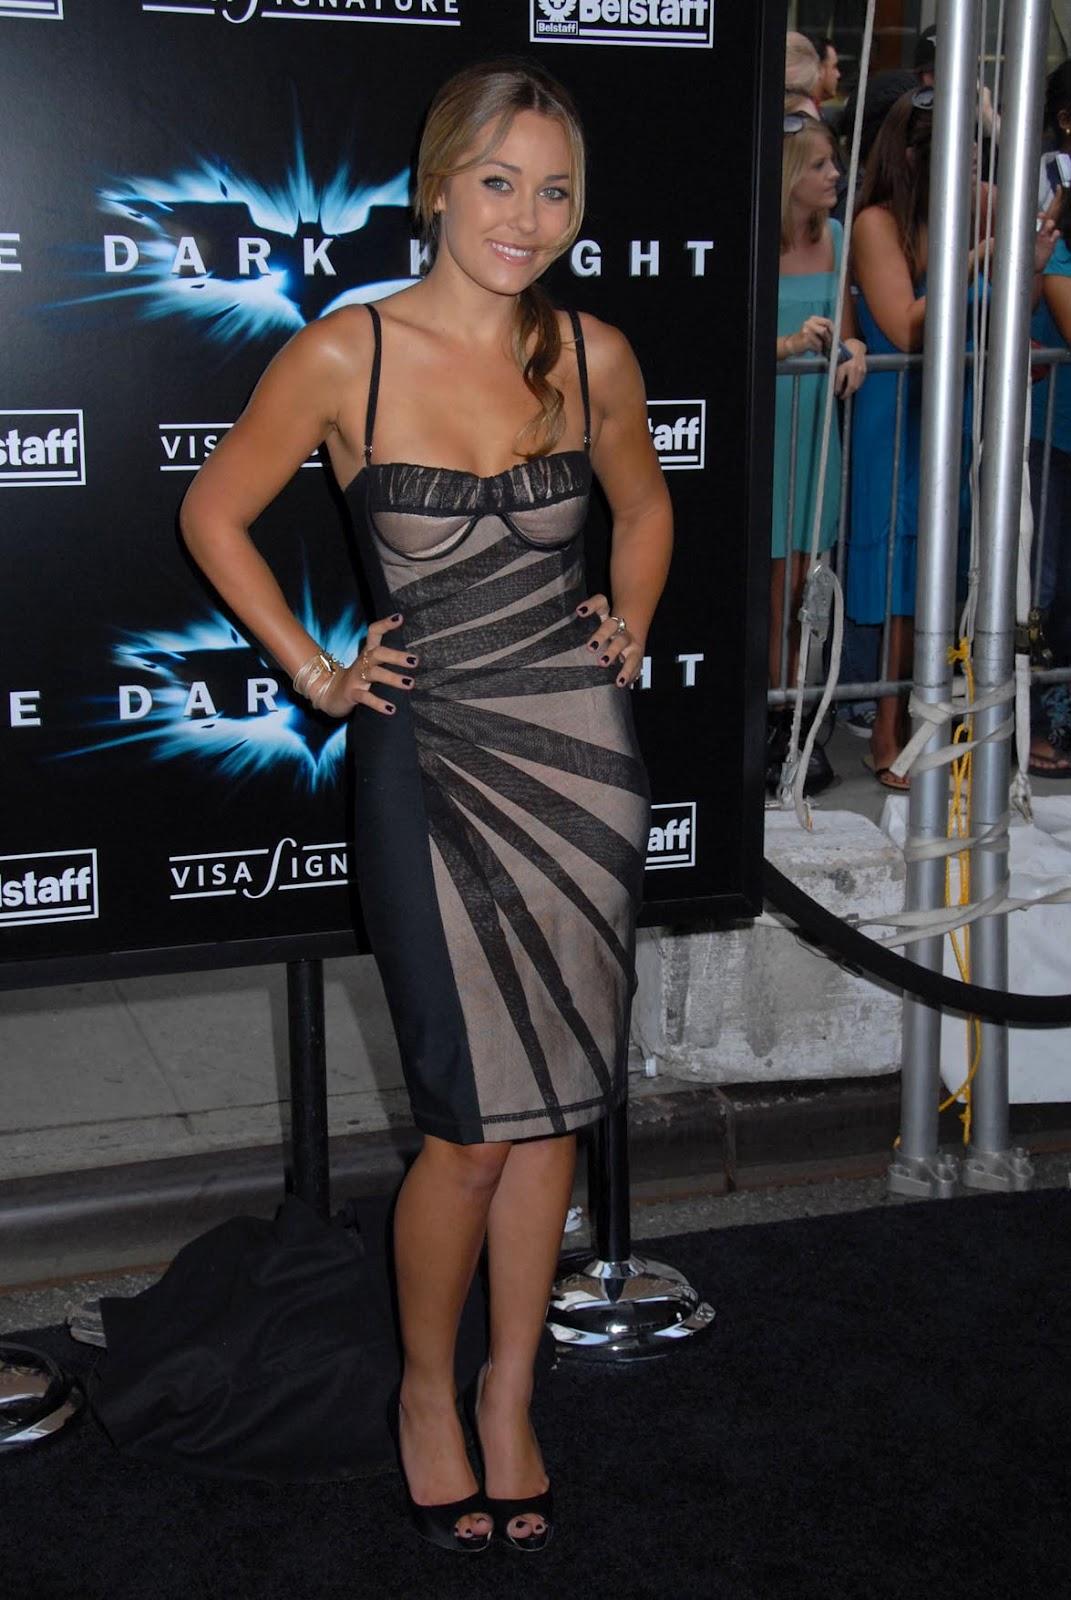 LifestyleBay: Lauren Conrad hot photos showing her little hills Kim Kardashian